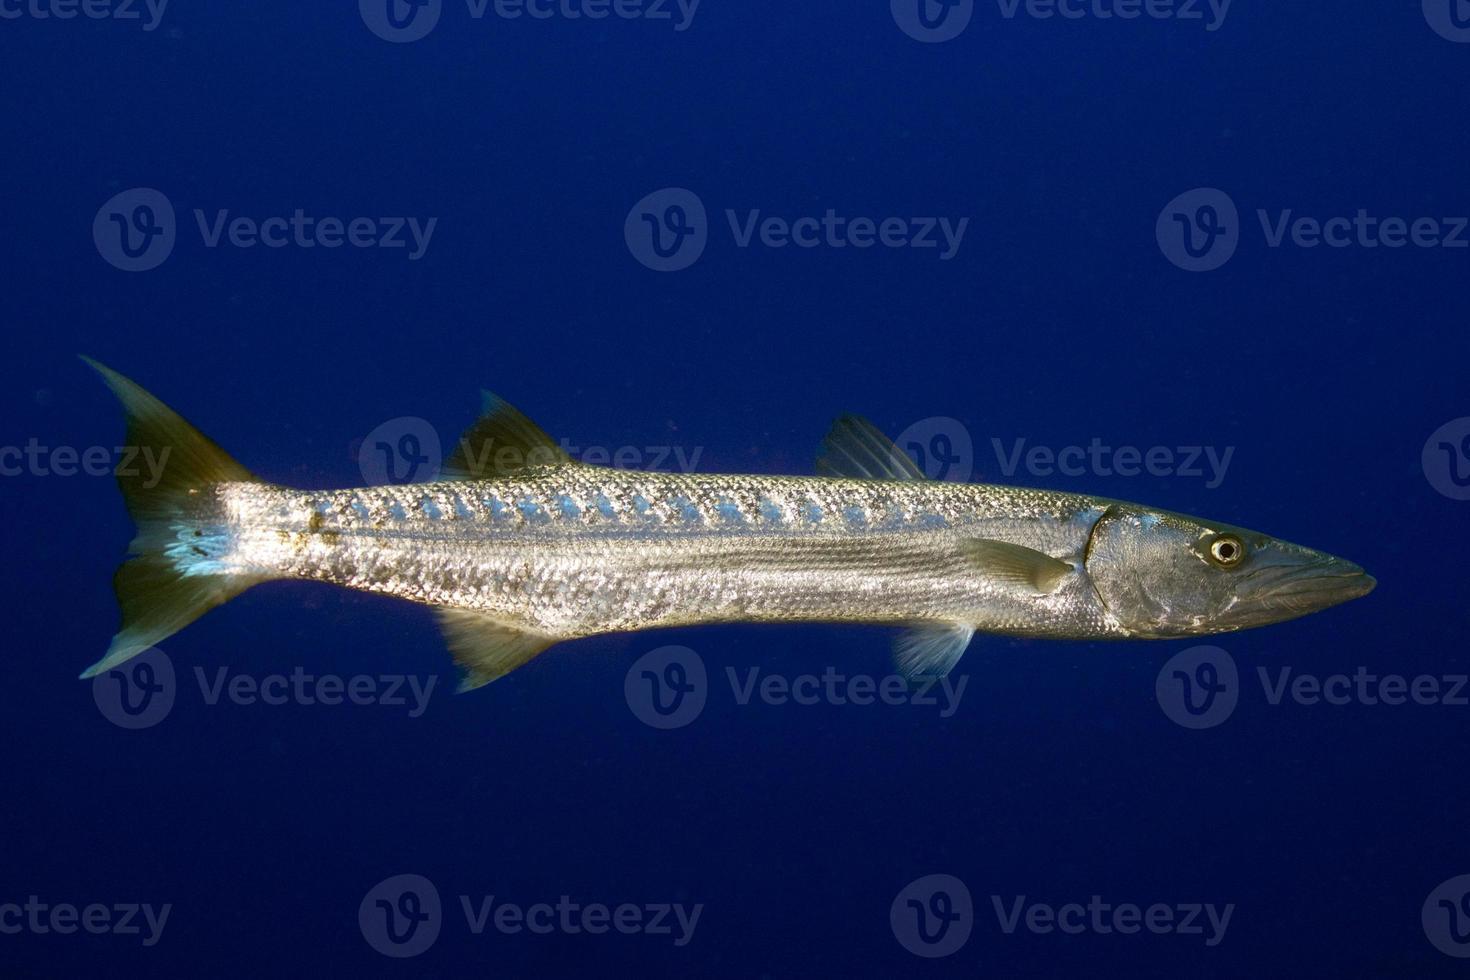 Great Barracuda photo